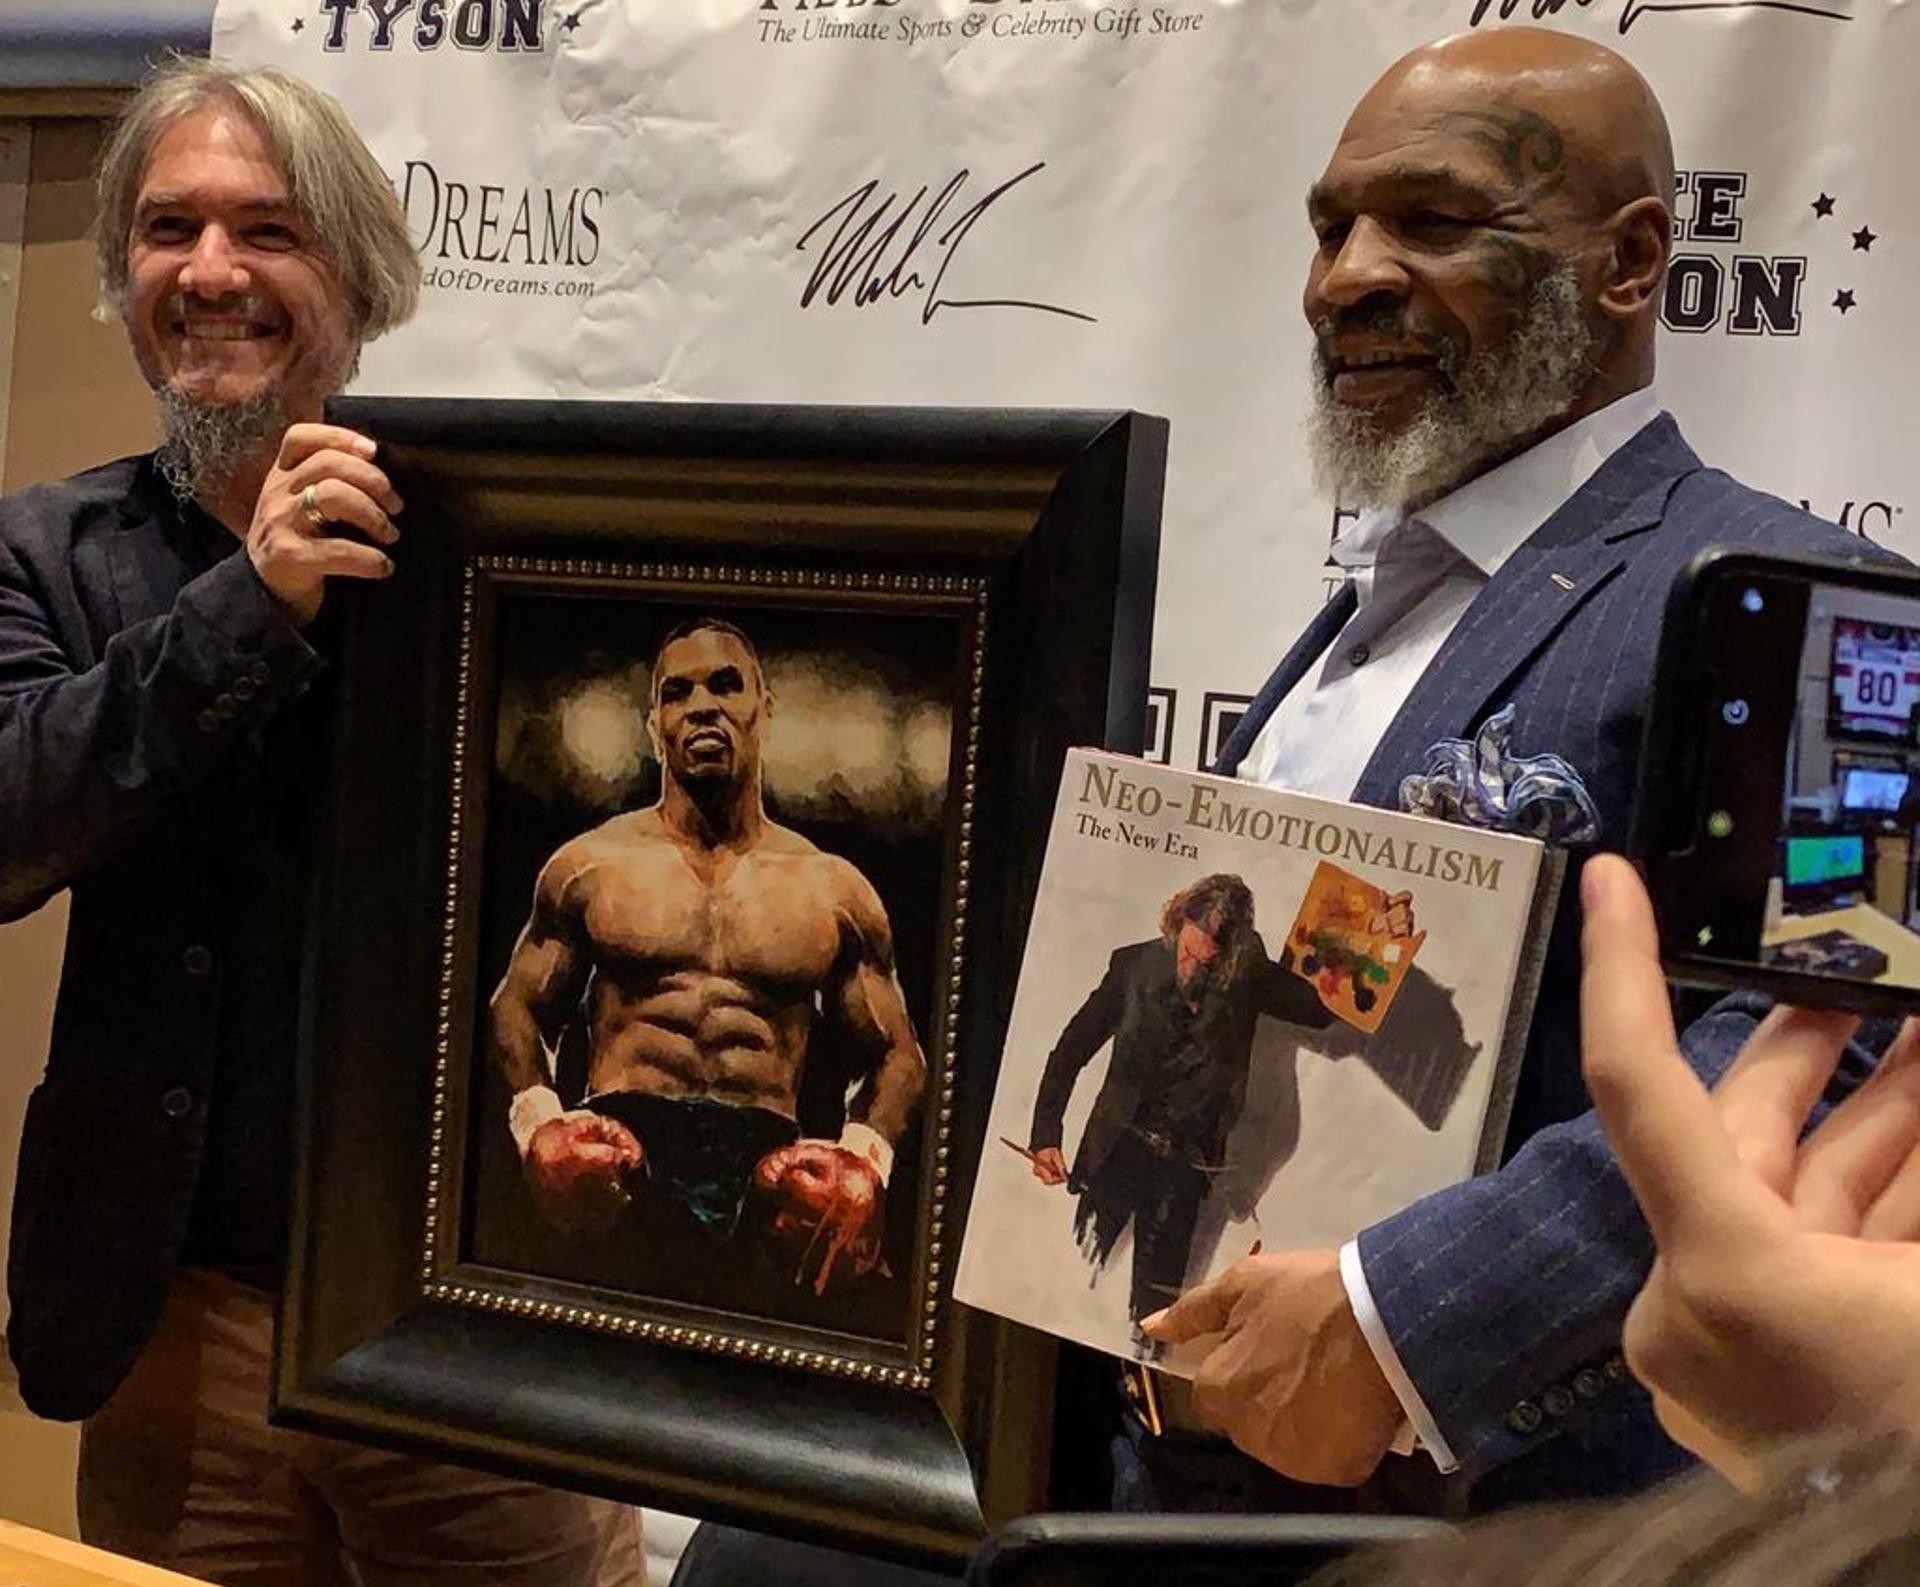 Mike Tyson standing next to Fabian Perez holding portrait